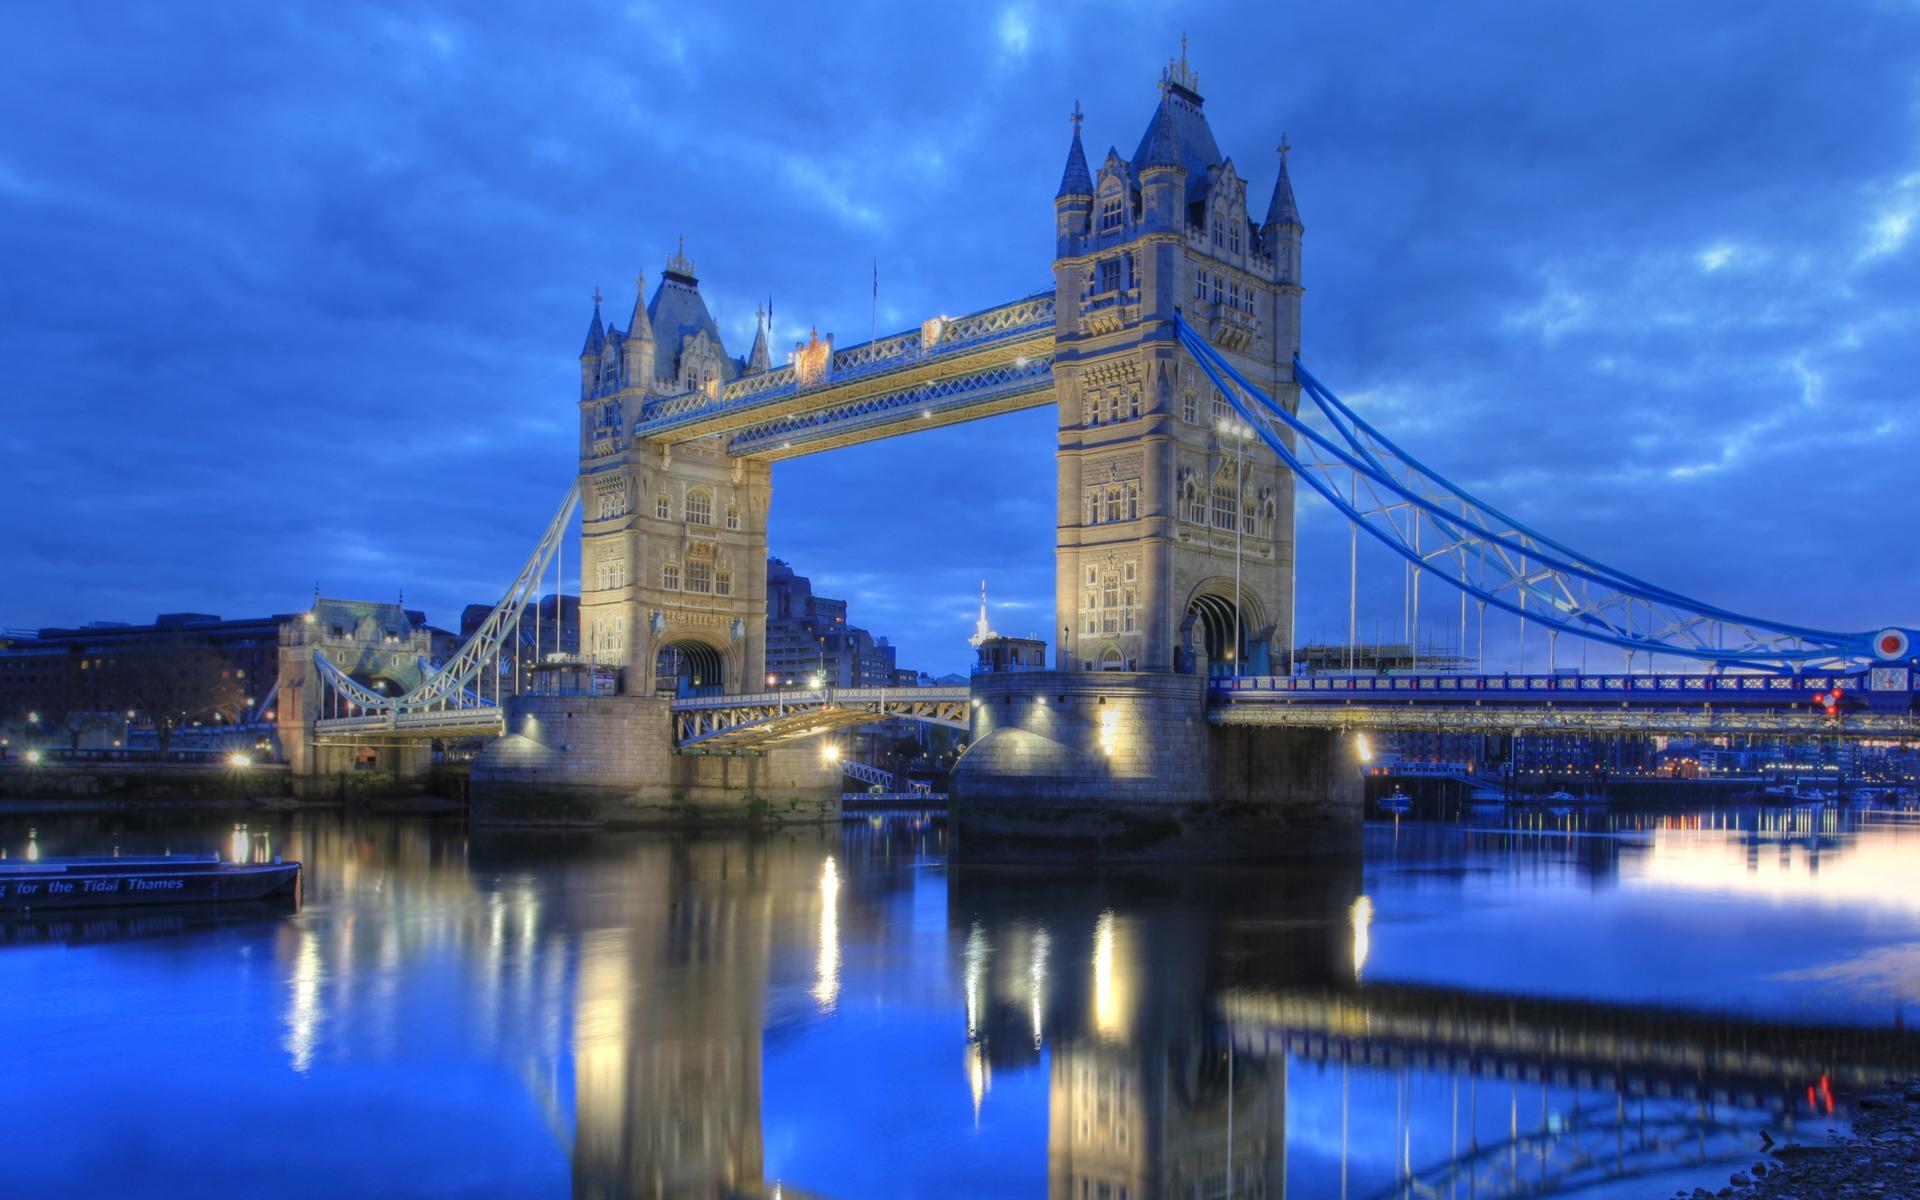 London Tower Bridge Wallpaper 1920x1200